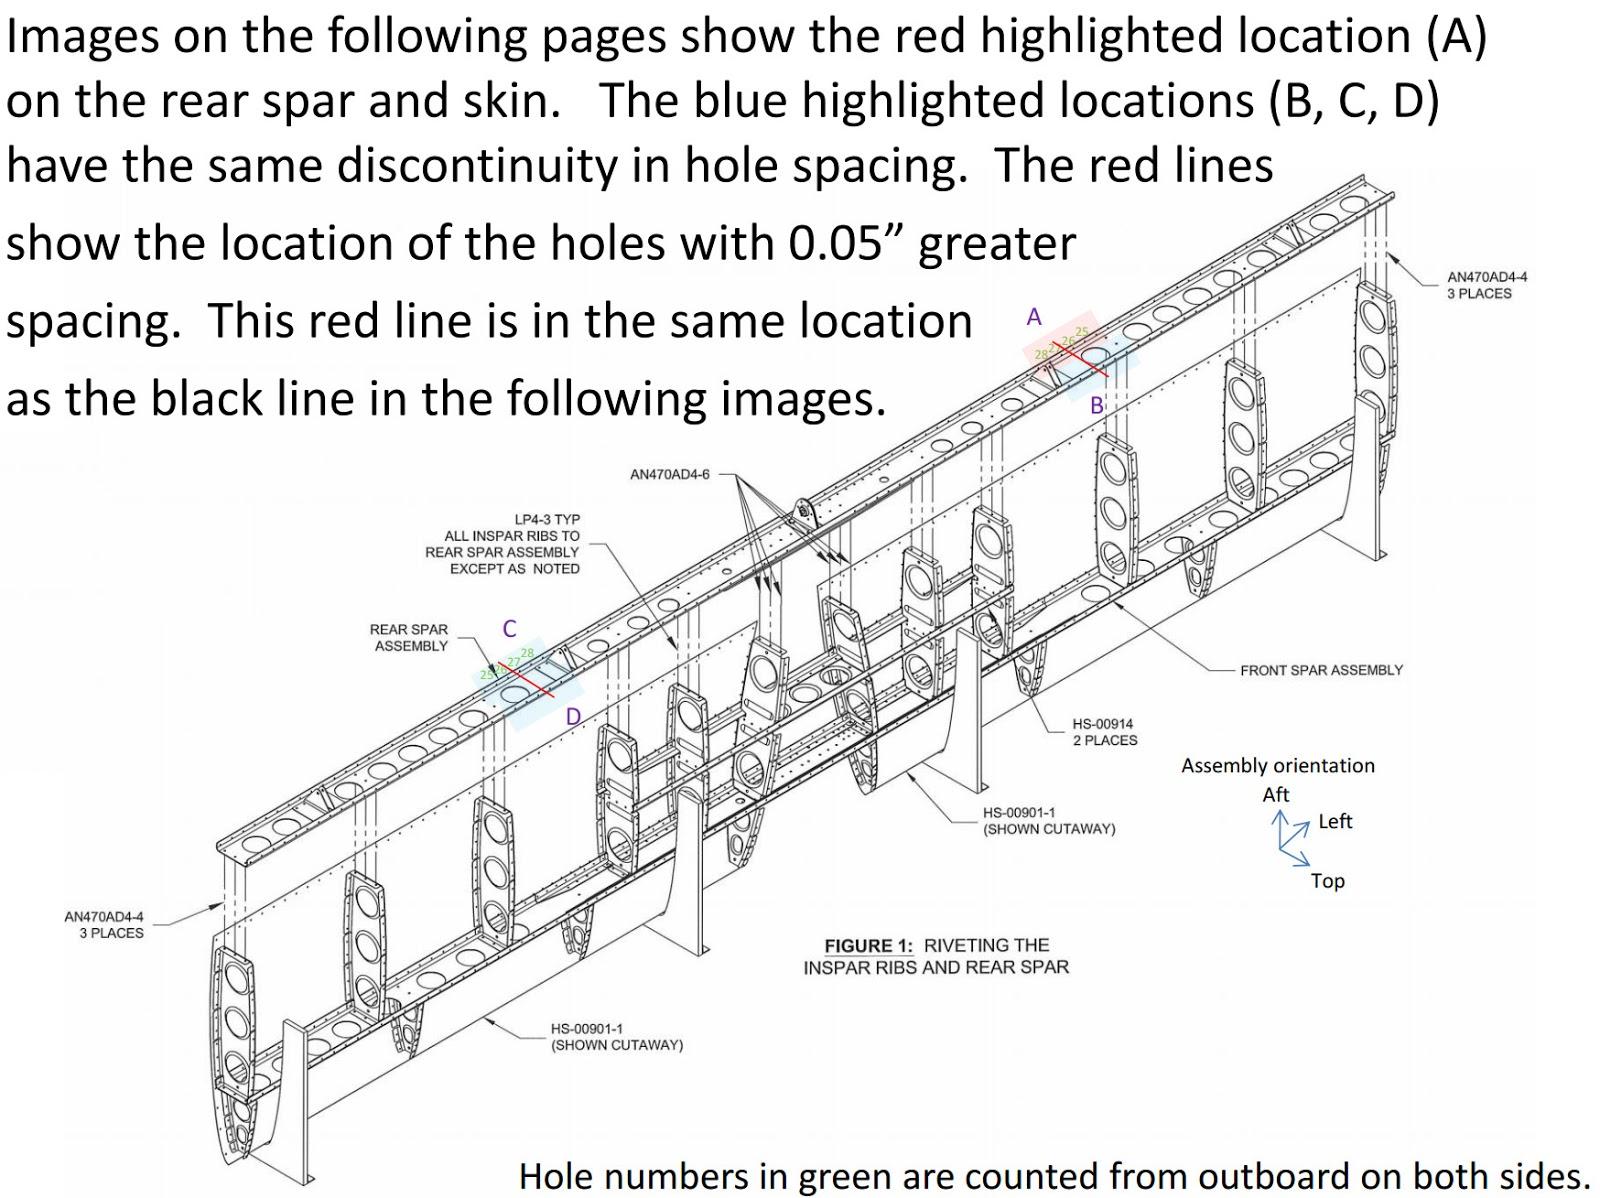 E S Van S Rv 14a Empennage Horizontal Stabilizer Factory Error On Rear Spar